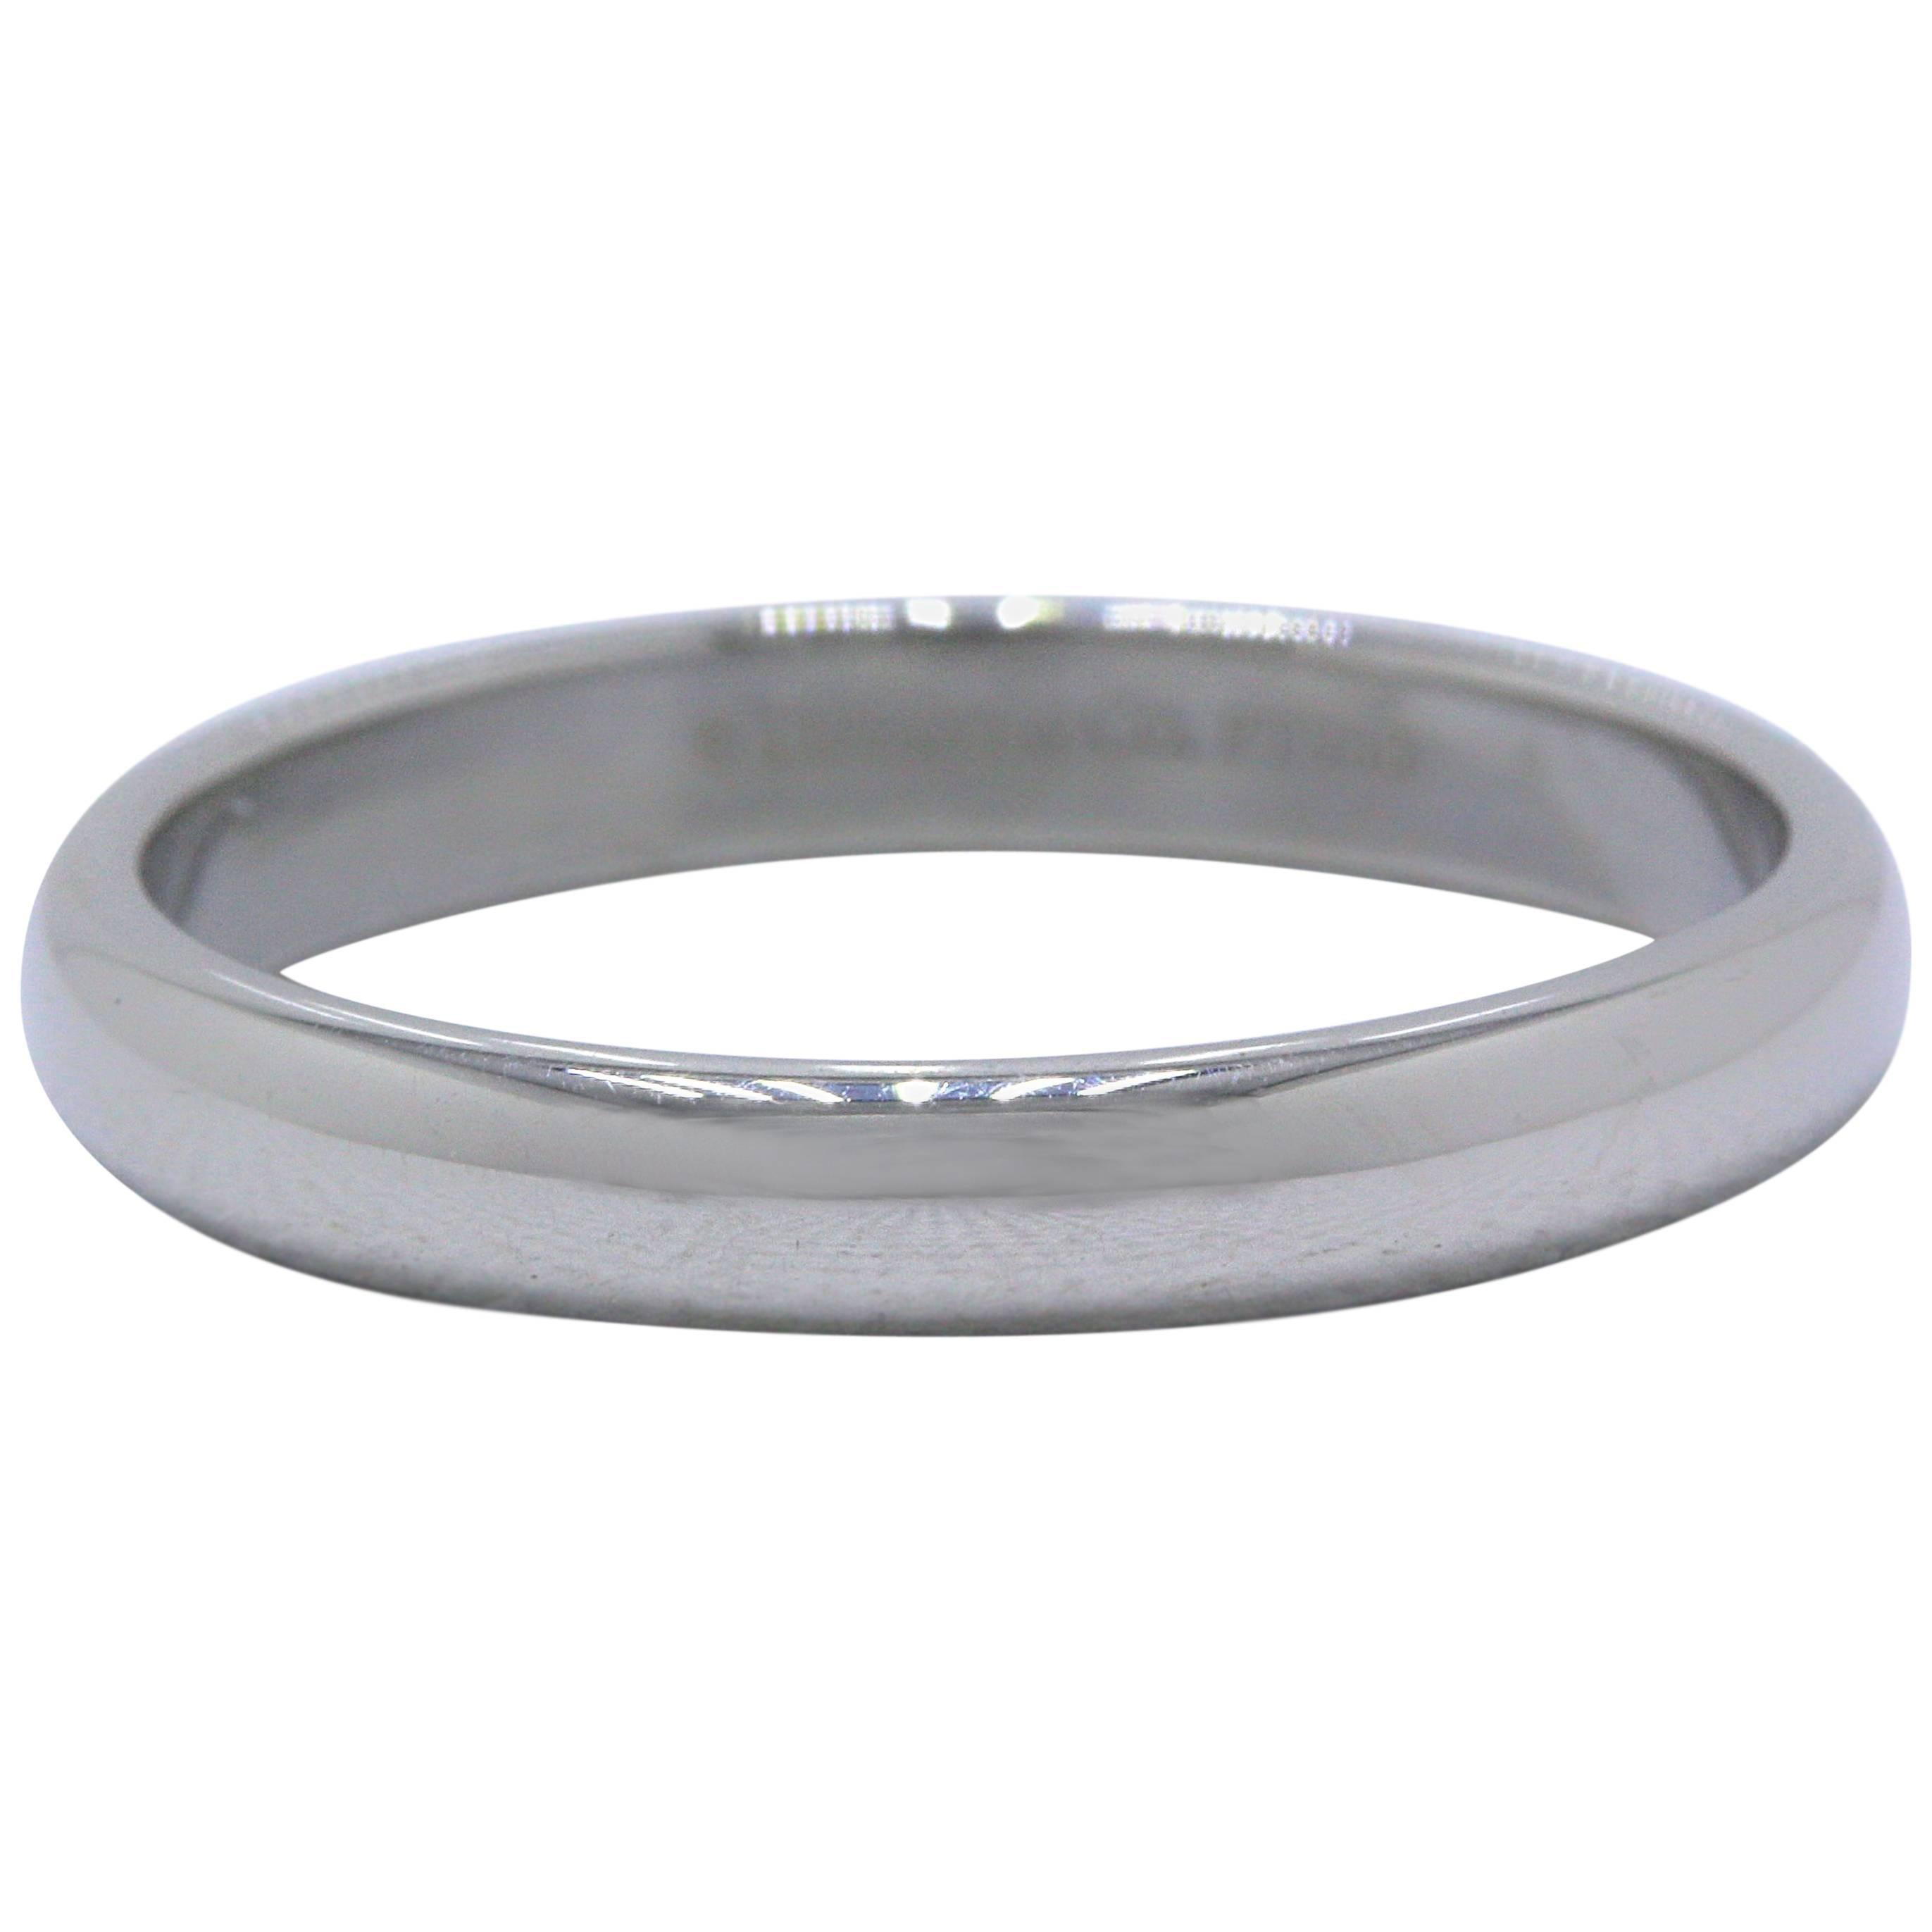 Tiffany & Co. Lucida Platinum Wedding Band Ring 3 mm